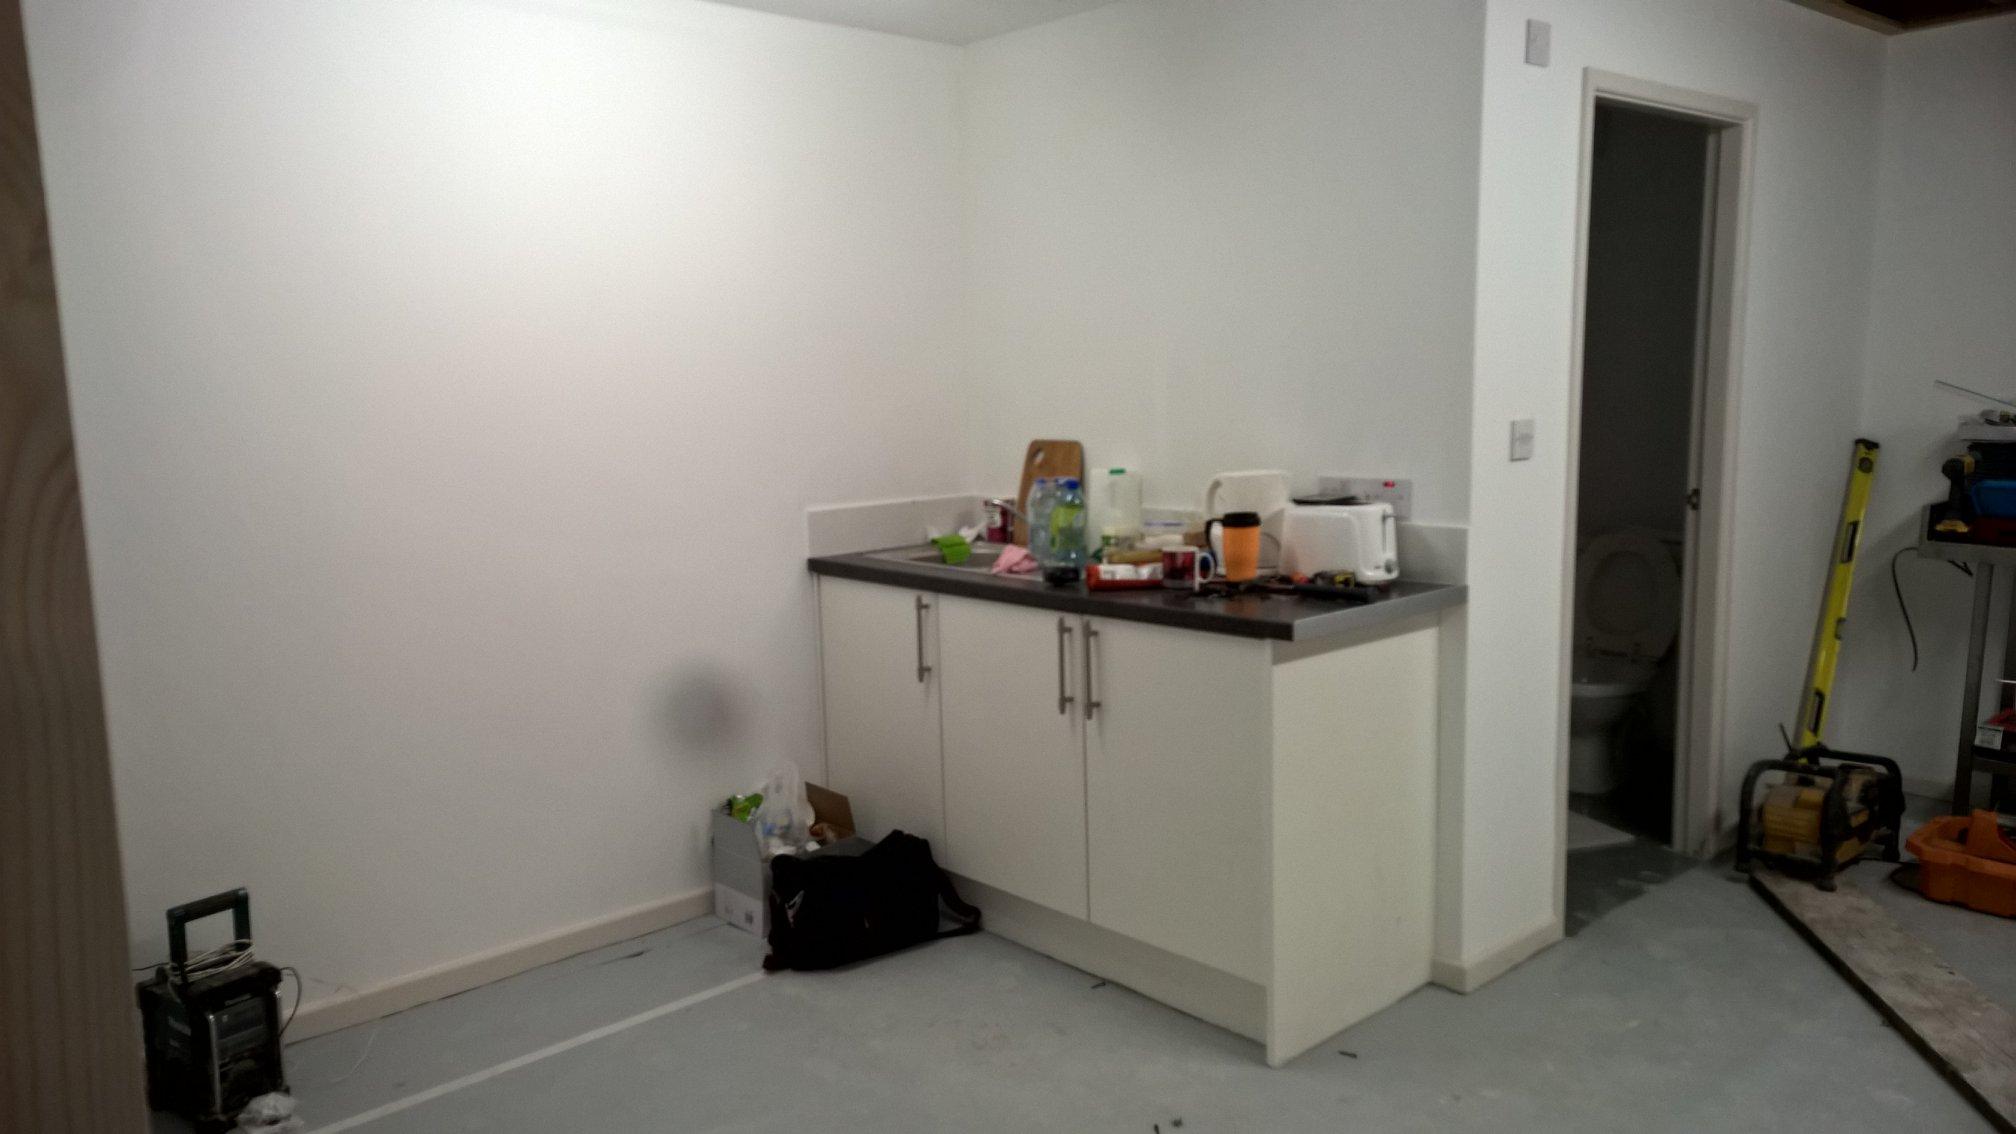 Unfinished kitchen